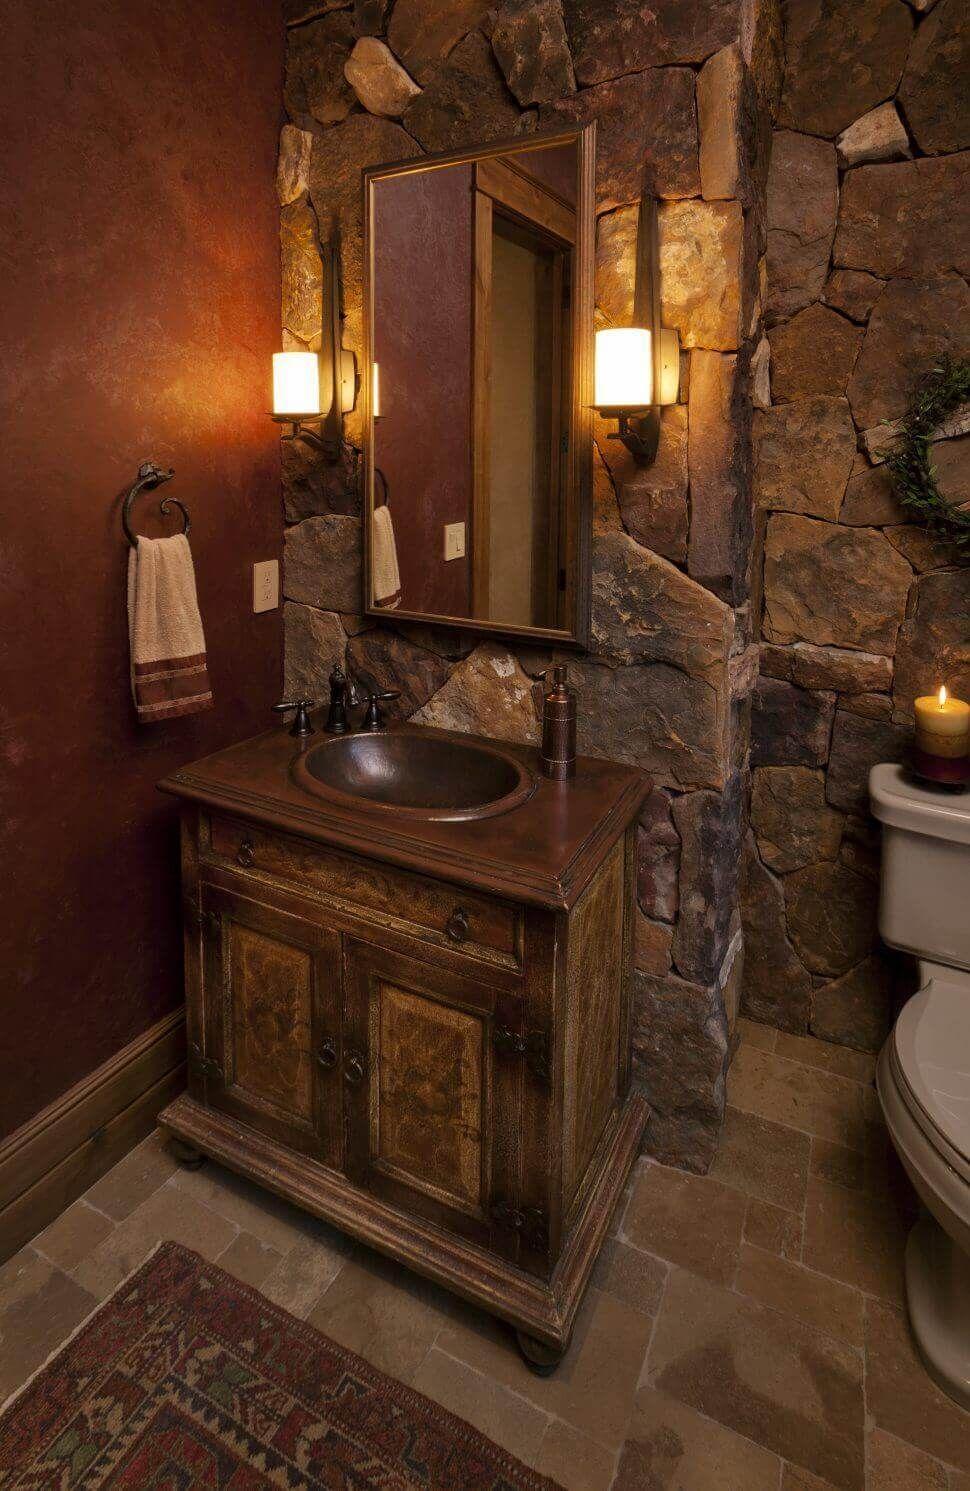 31 Impressive Diy Rustic Farmhouse Bathroom Vanity Ideas In 2020 Rustic Bathrooms Rustic Bathroom Lighting Rustic Bathroom